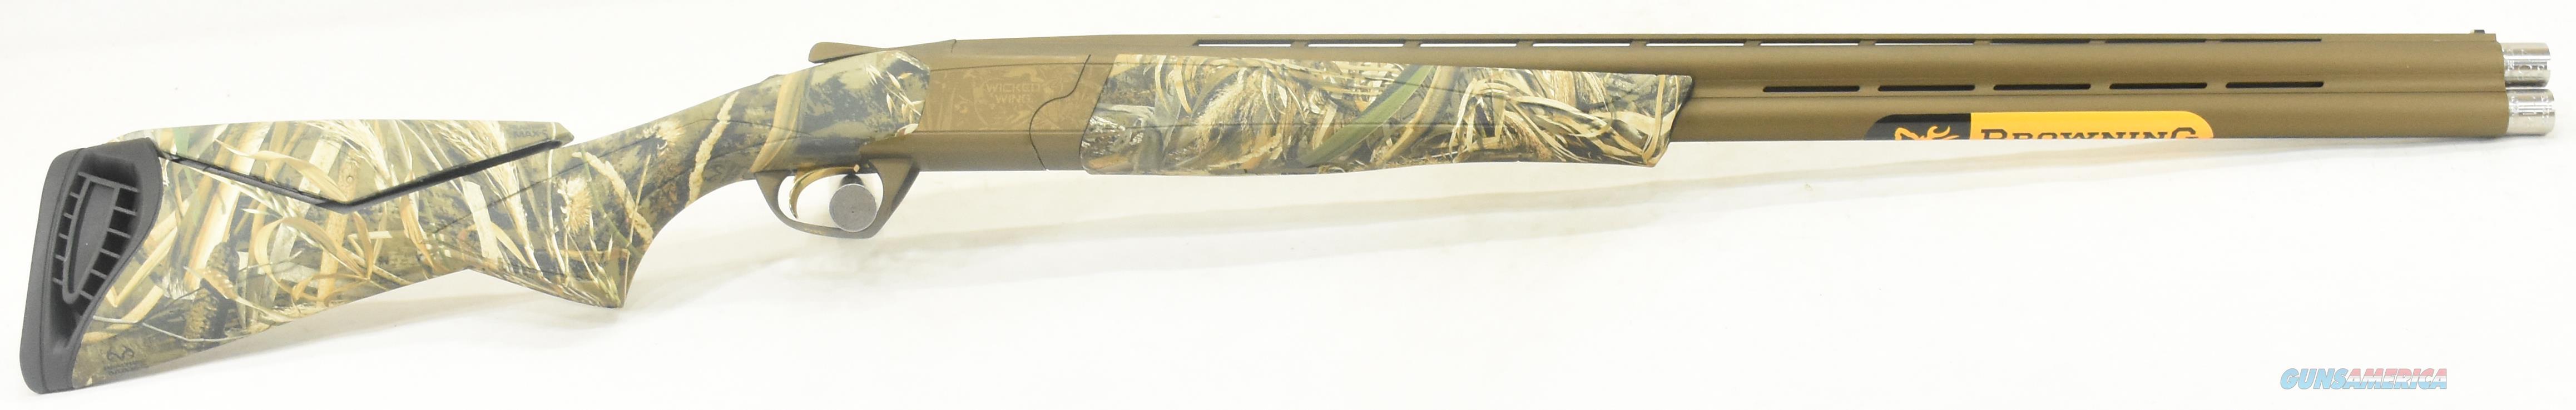 Cynergy Wicked Wing Max5 12Ga 28-3.5In 018717204  Guns > Shotguns > Browning Shotguns > Over Unders > Cynergy > Hunting